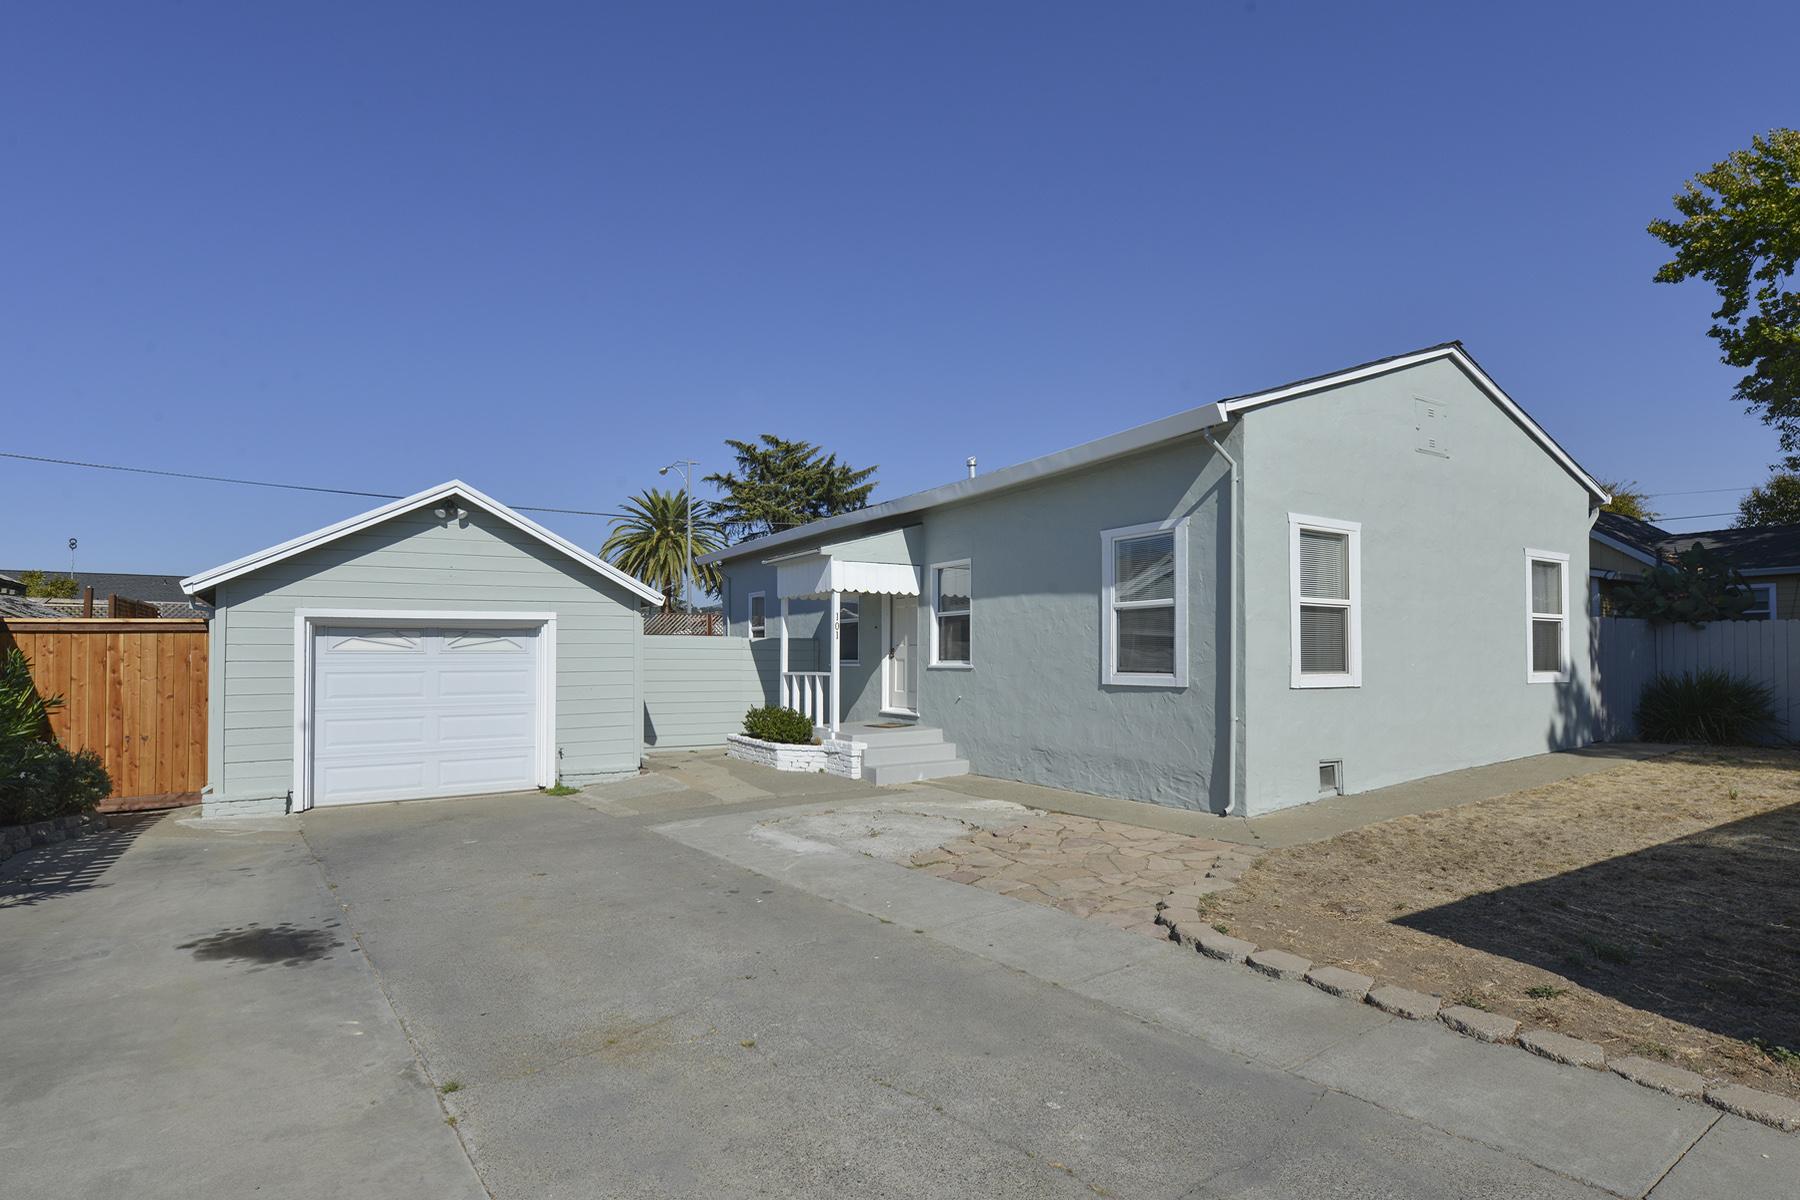 Property For Sale at 101 Adobe Ln, Napa, CA 94559